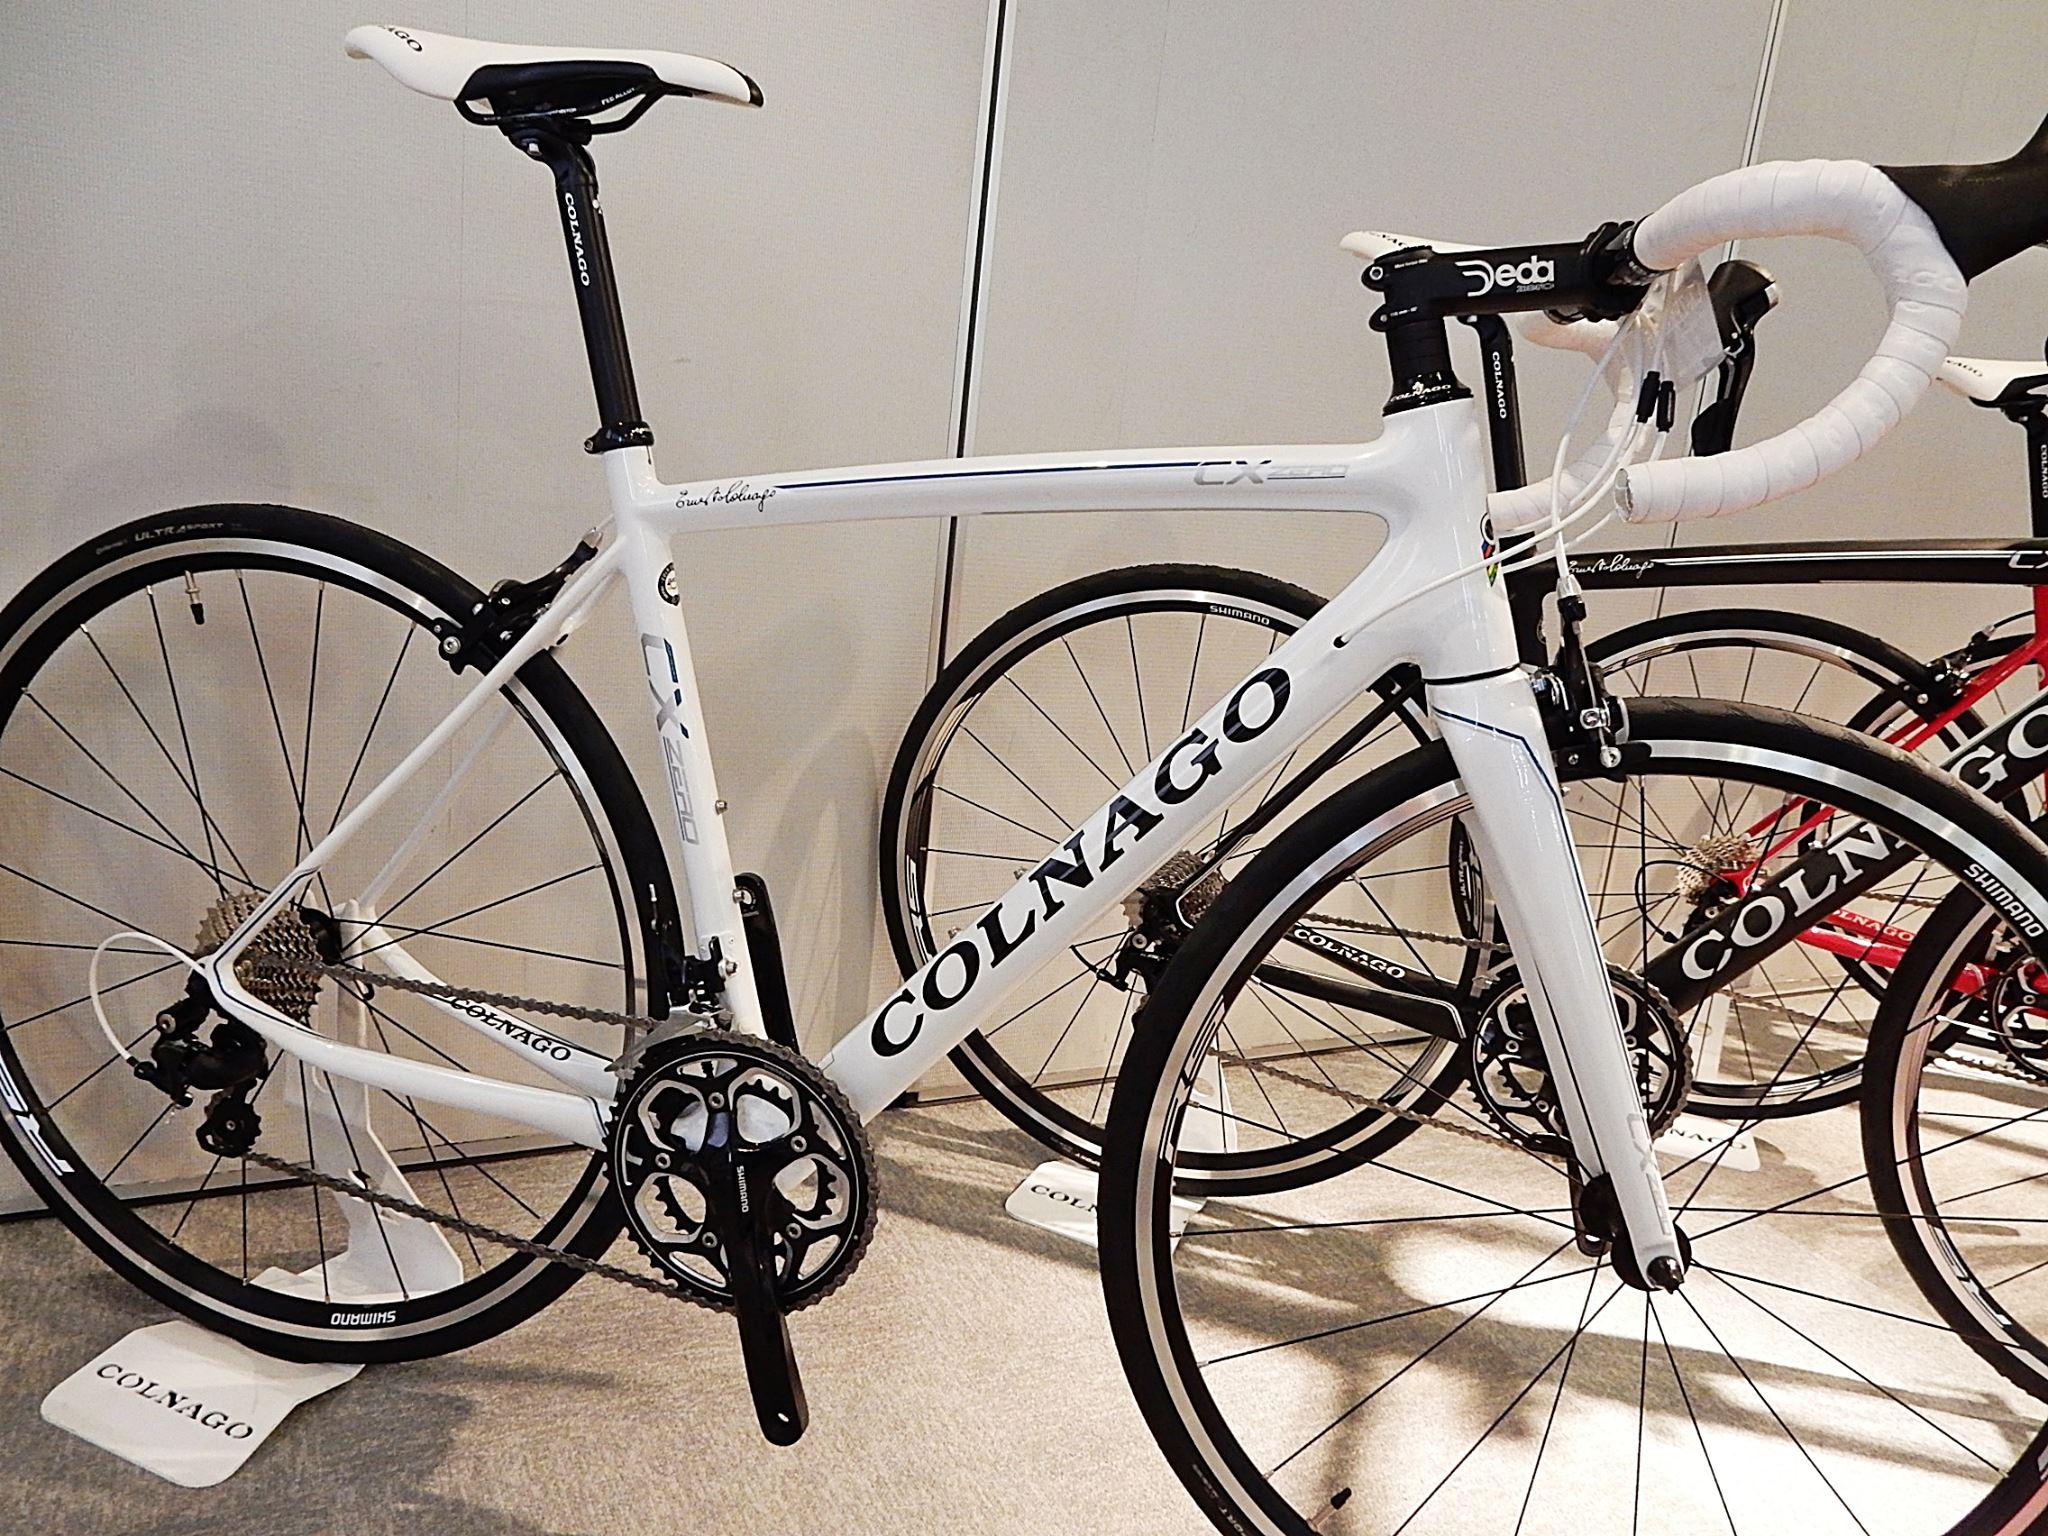 2017 COLNAGO colnago コルナゴ CX-ZERO cx-zero シーエックスゼロ カーボンロードバイク 完成車 レース サイクリング ロングライド 広島県福山市 FINE fine ファイン